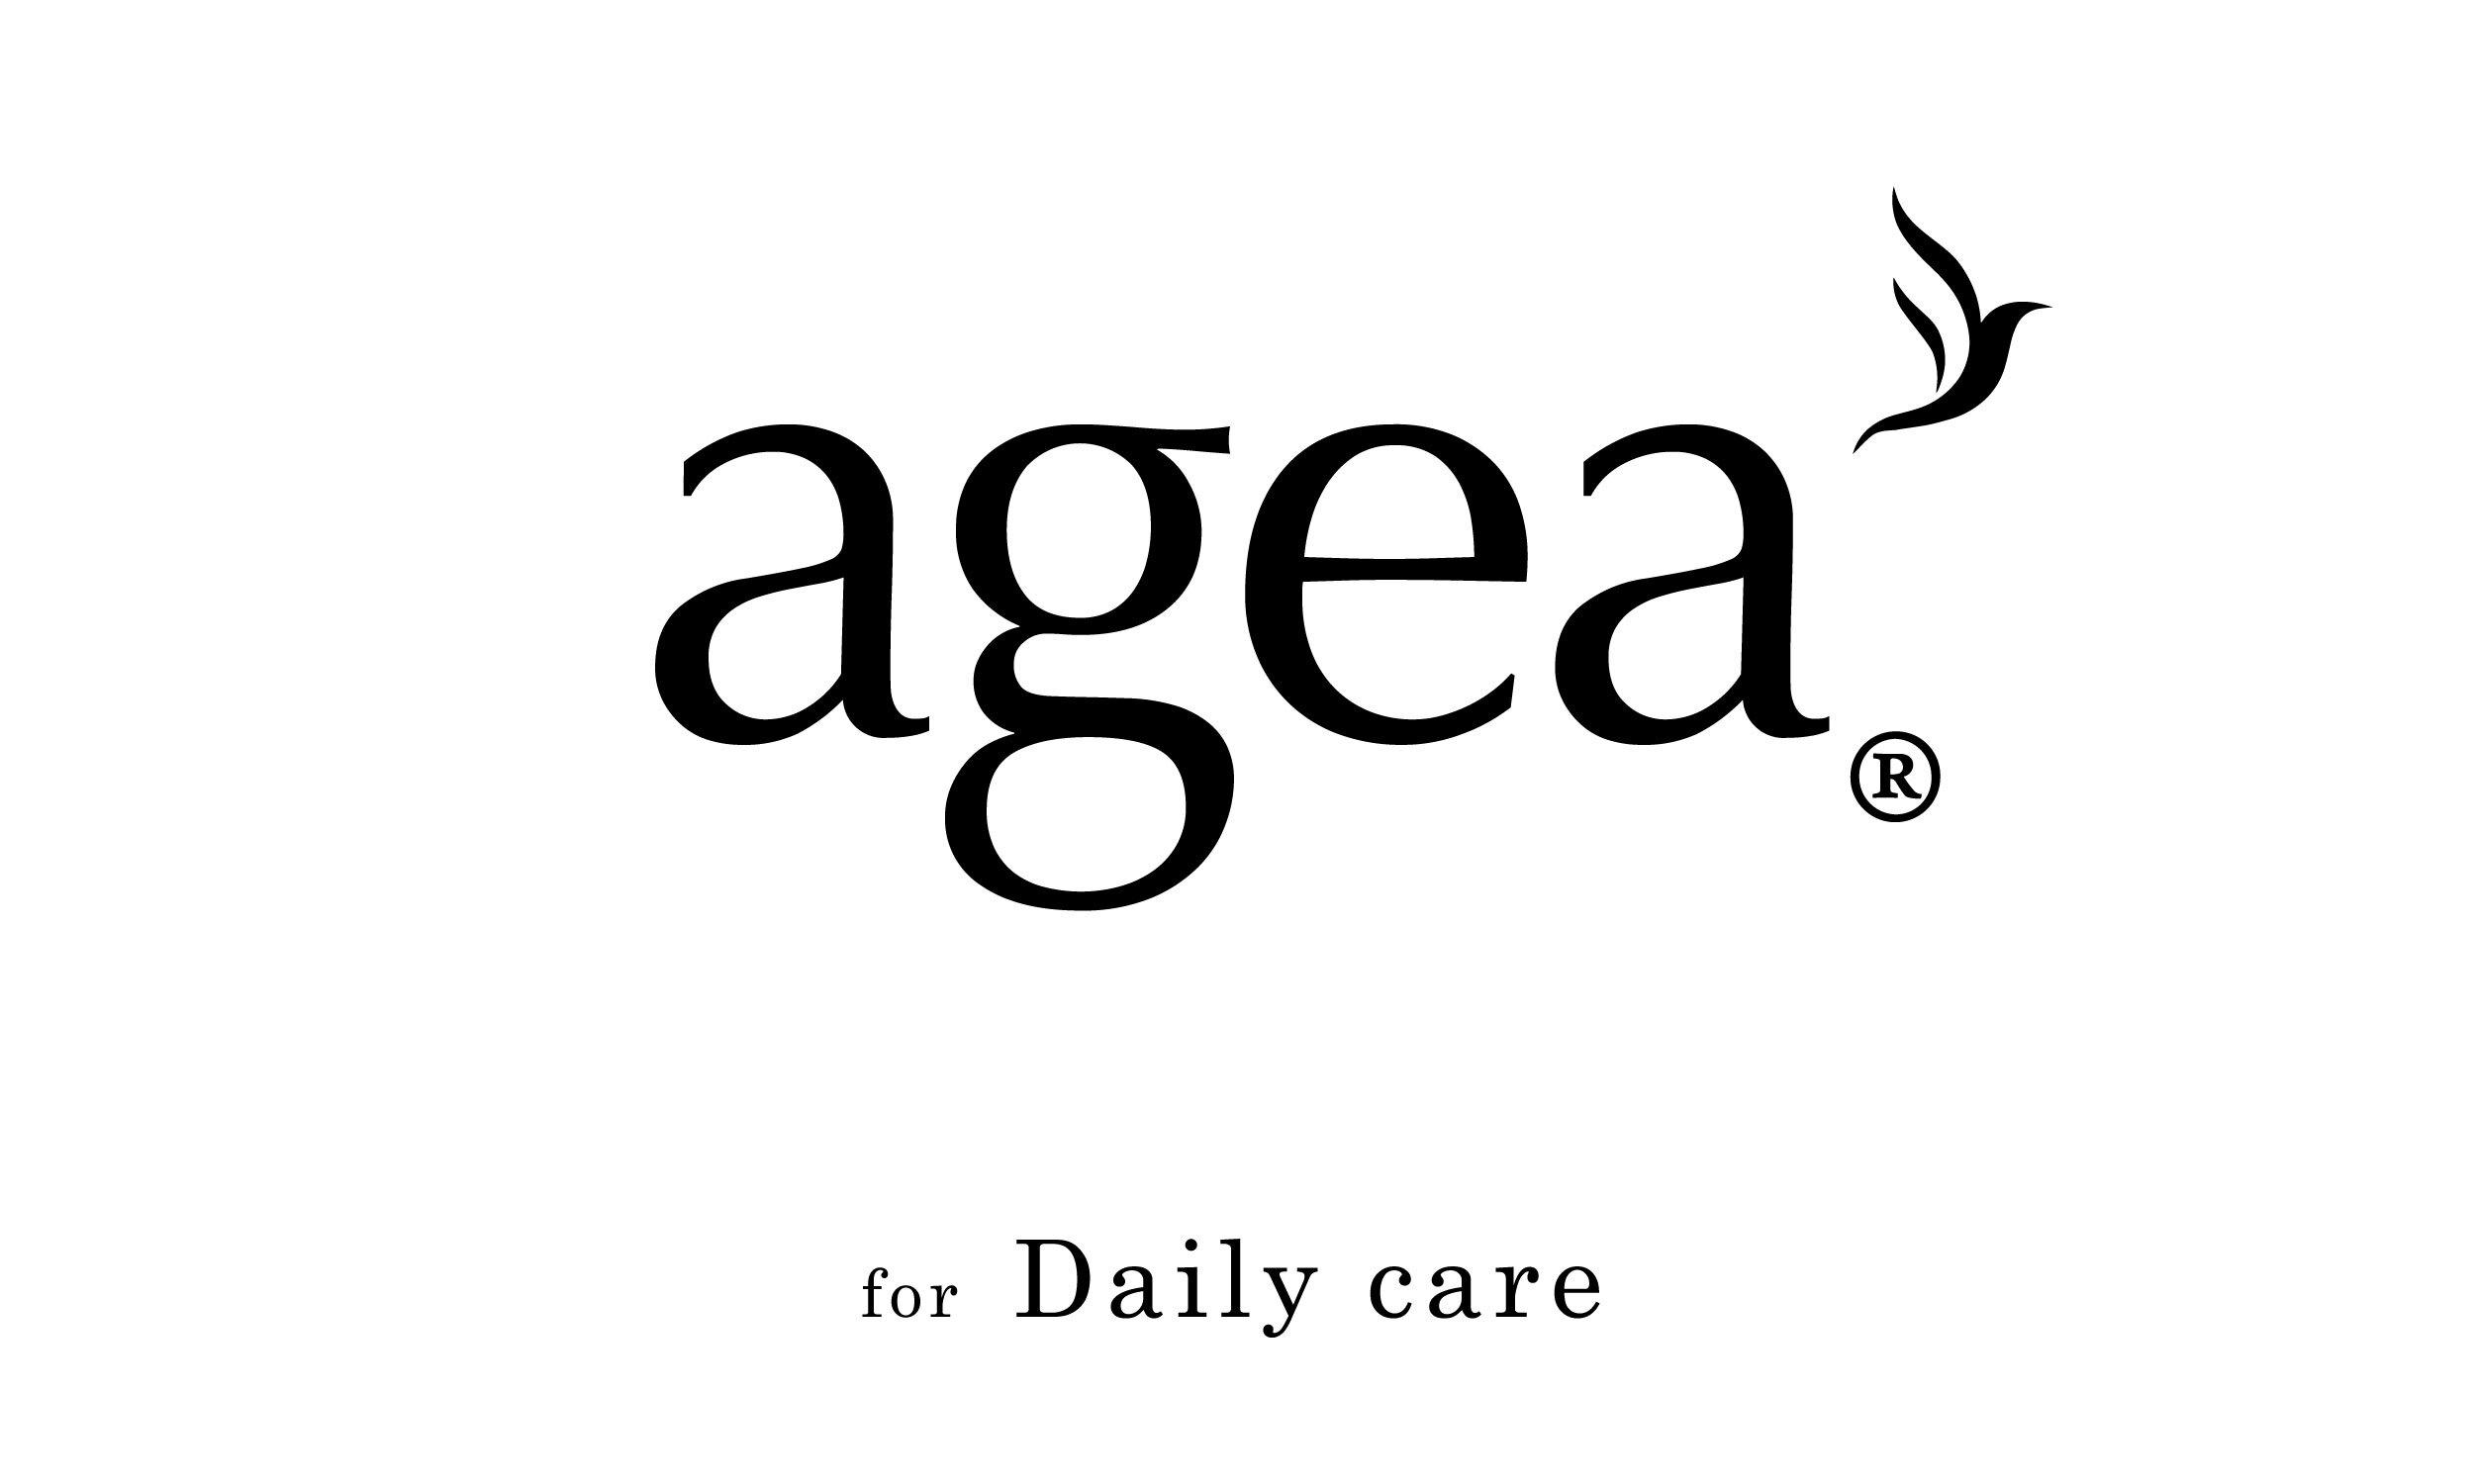 agea 公式 online Store - エイジア オンライン ストア -